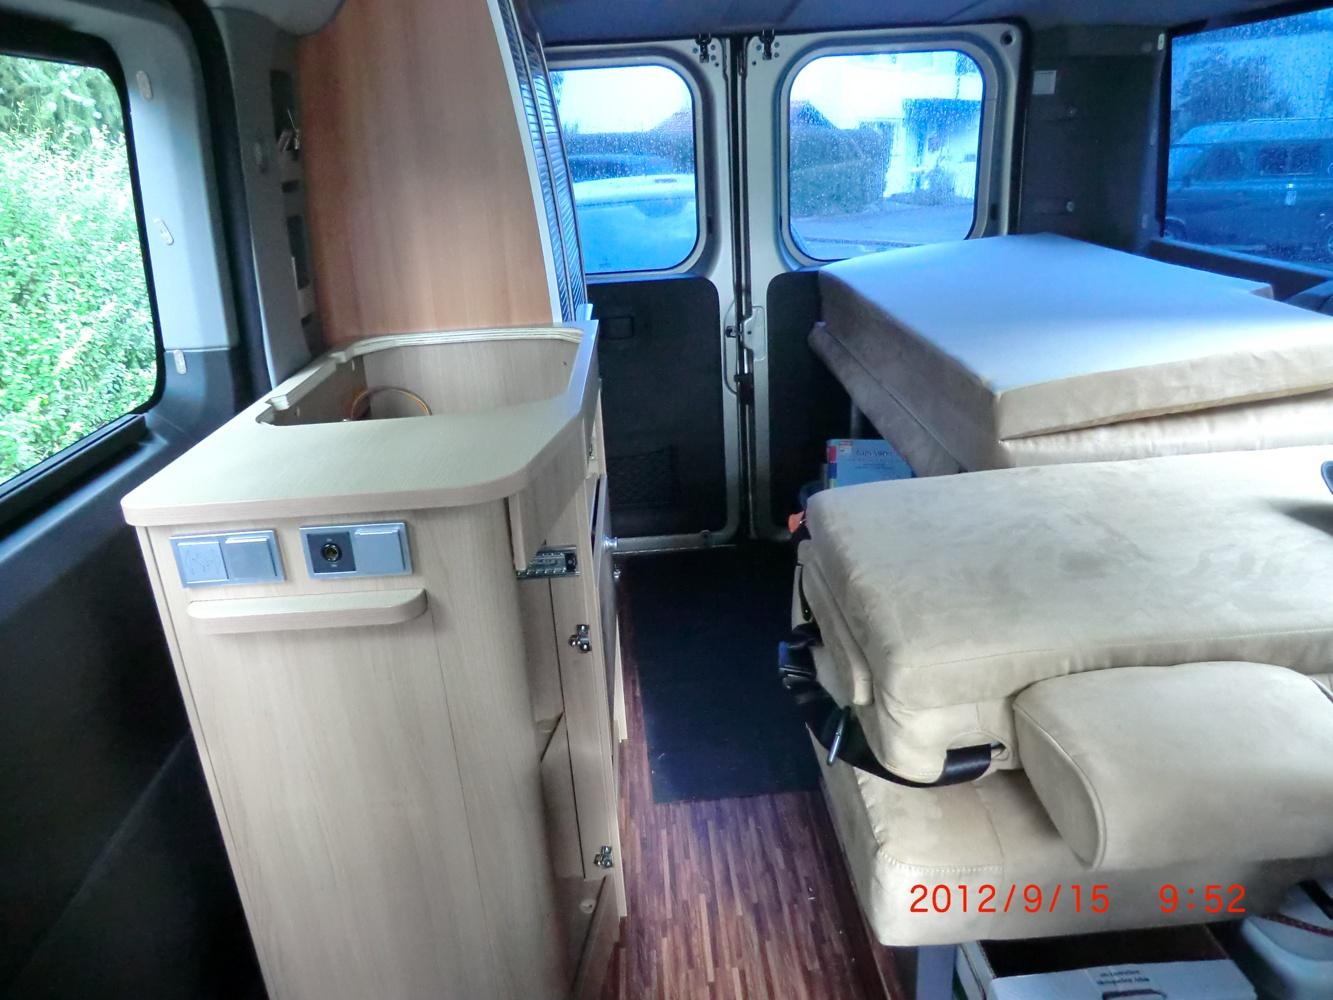 location fourgon aménagé - zorneding - hymer car 302 2011 | yescapa